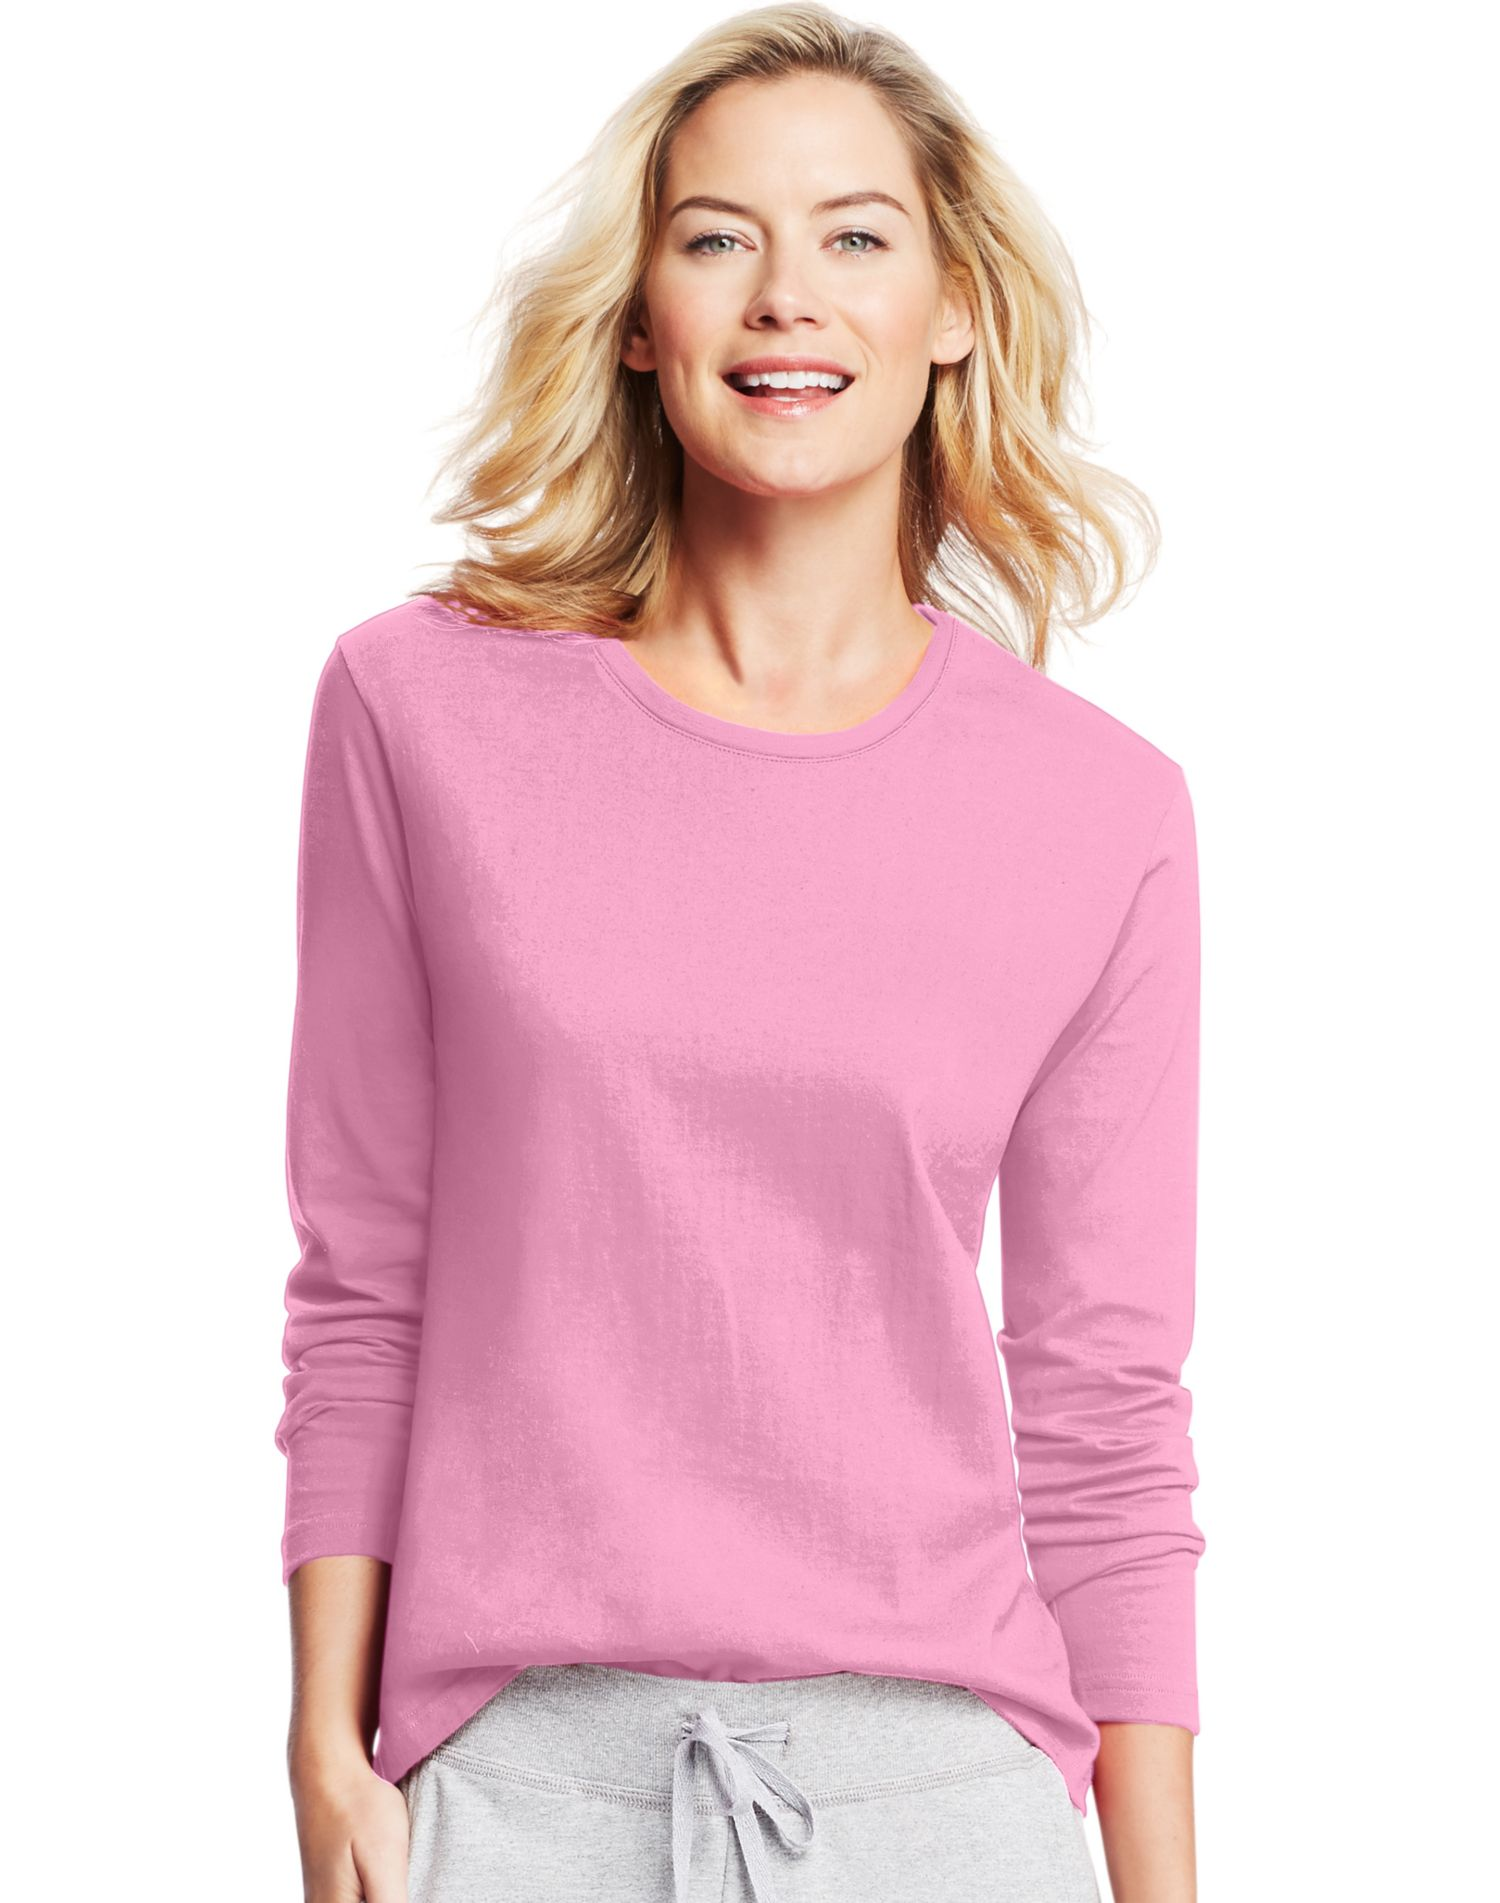 aa072b68011 Hanes Women`s Long-Sleeve Crewneck T-Shirt